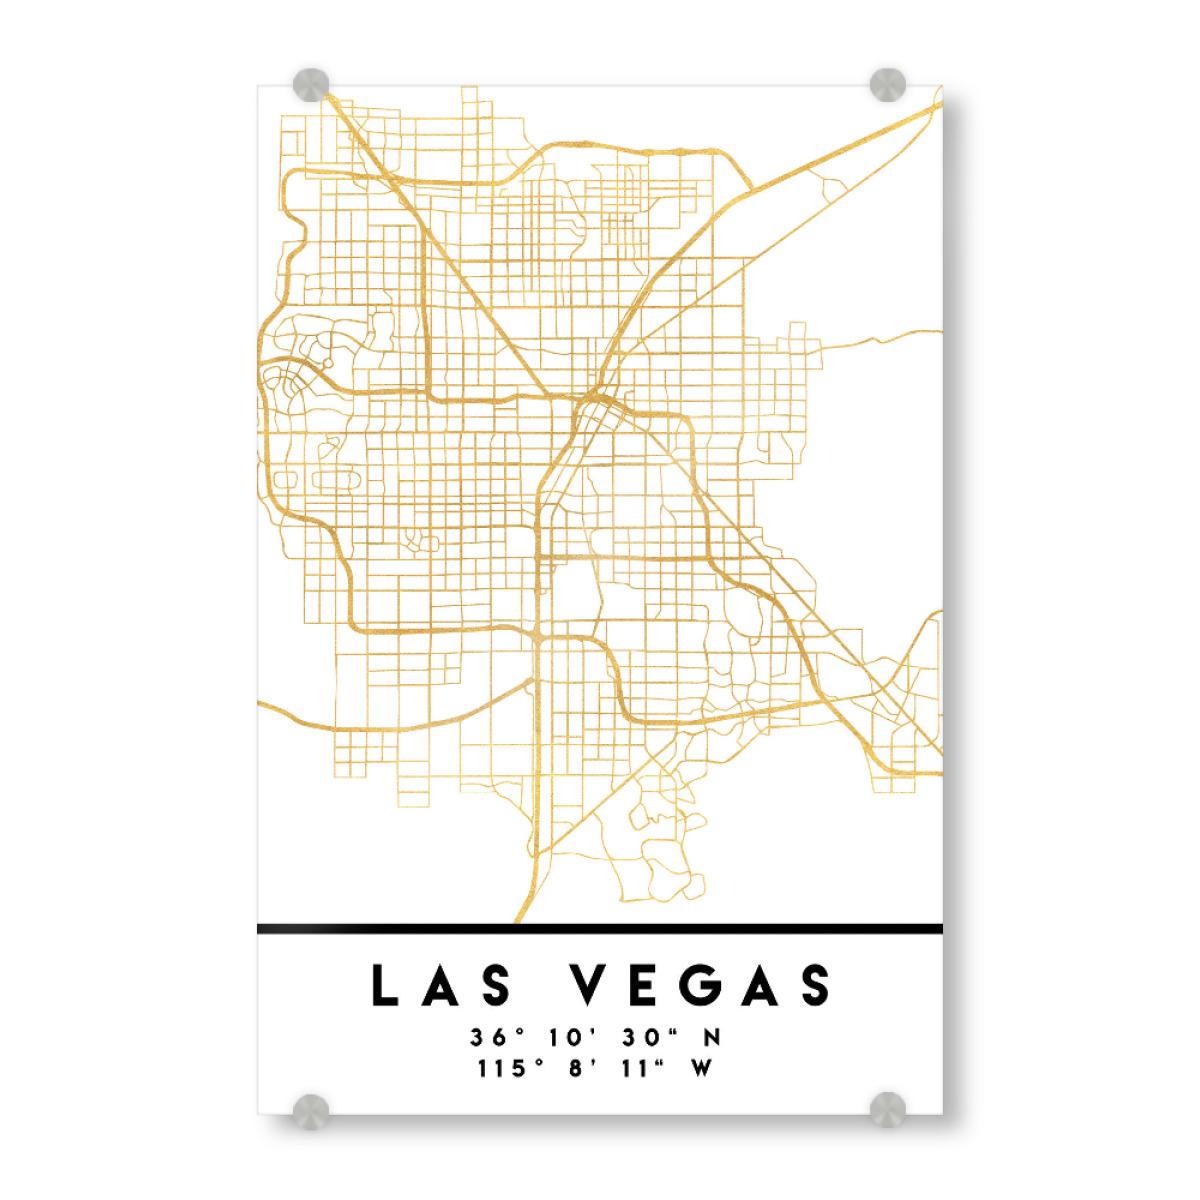 LAS VEGAS NEVADA STREET MAP ART als bei artboxONE kaufen